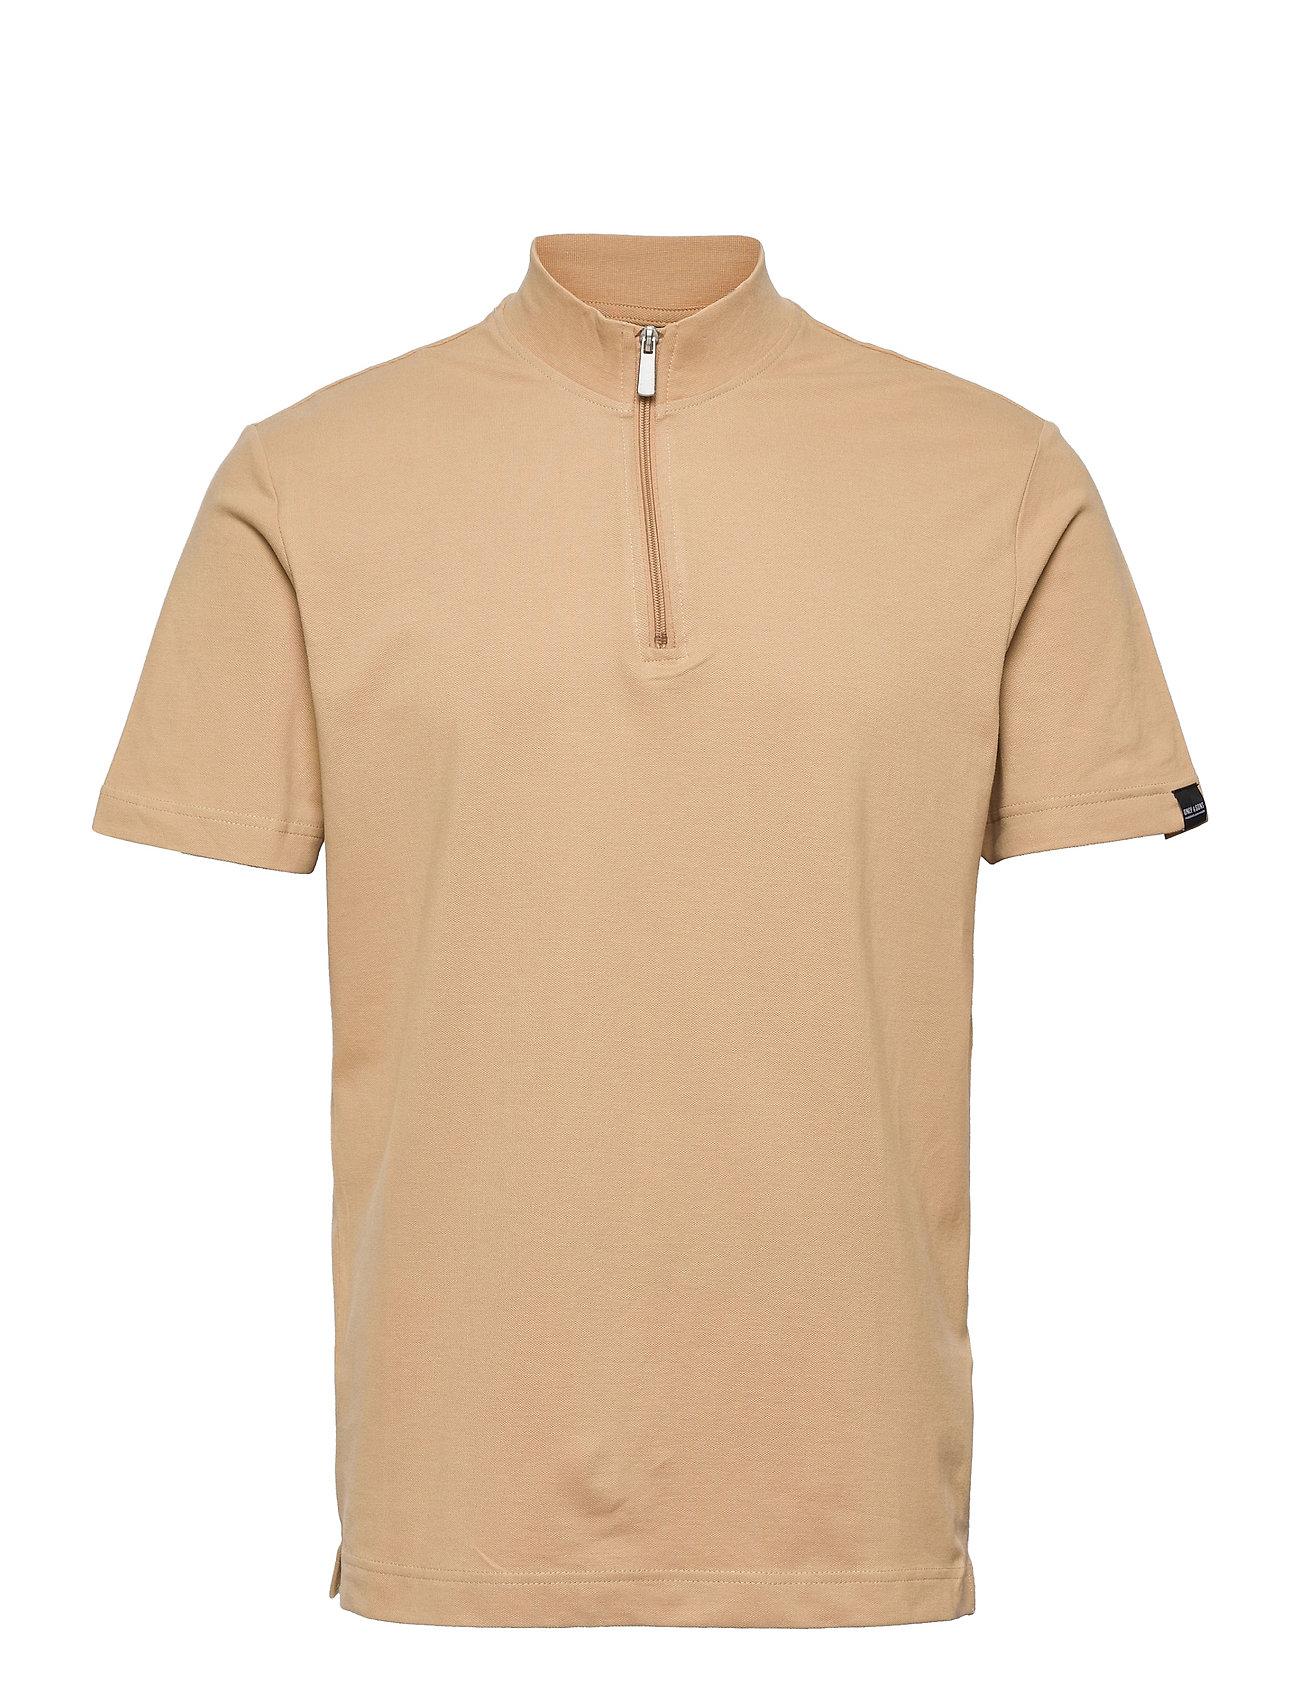 Onsvirl Life Reg 1/4 Zip Mock Neck Tee Polos Short-sleeved Beige ONLY & SONS